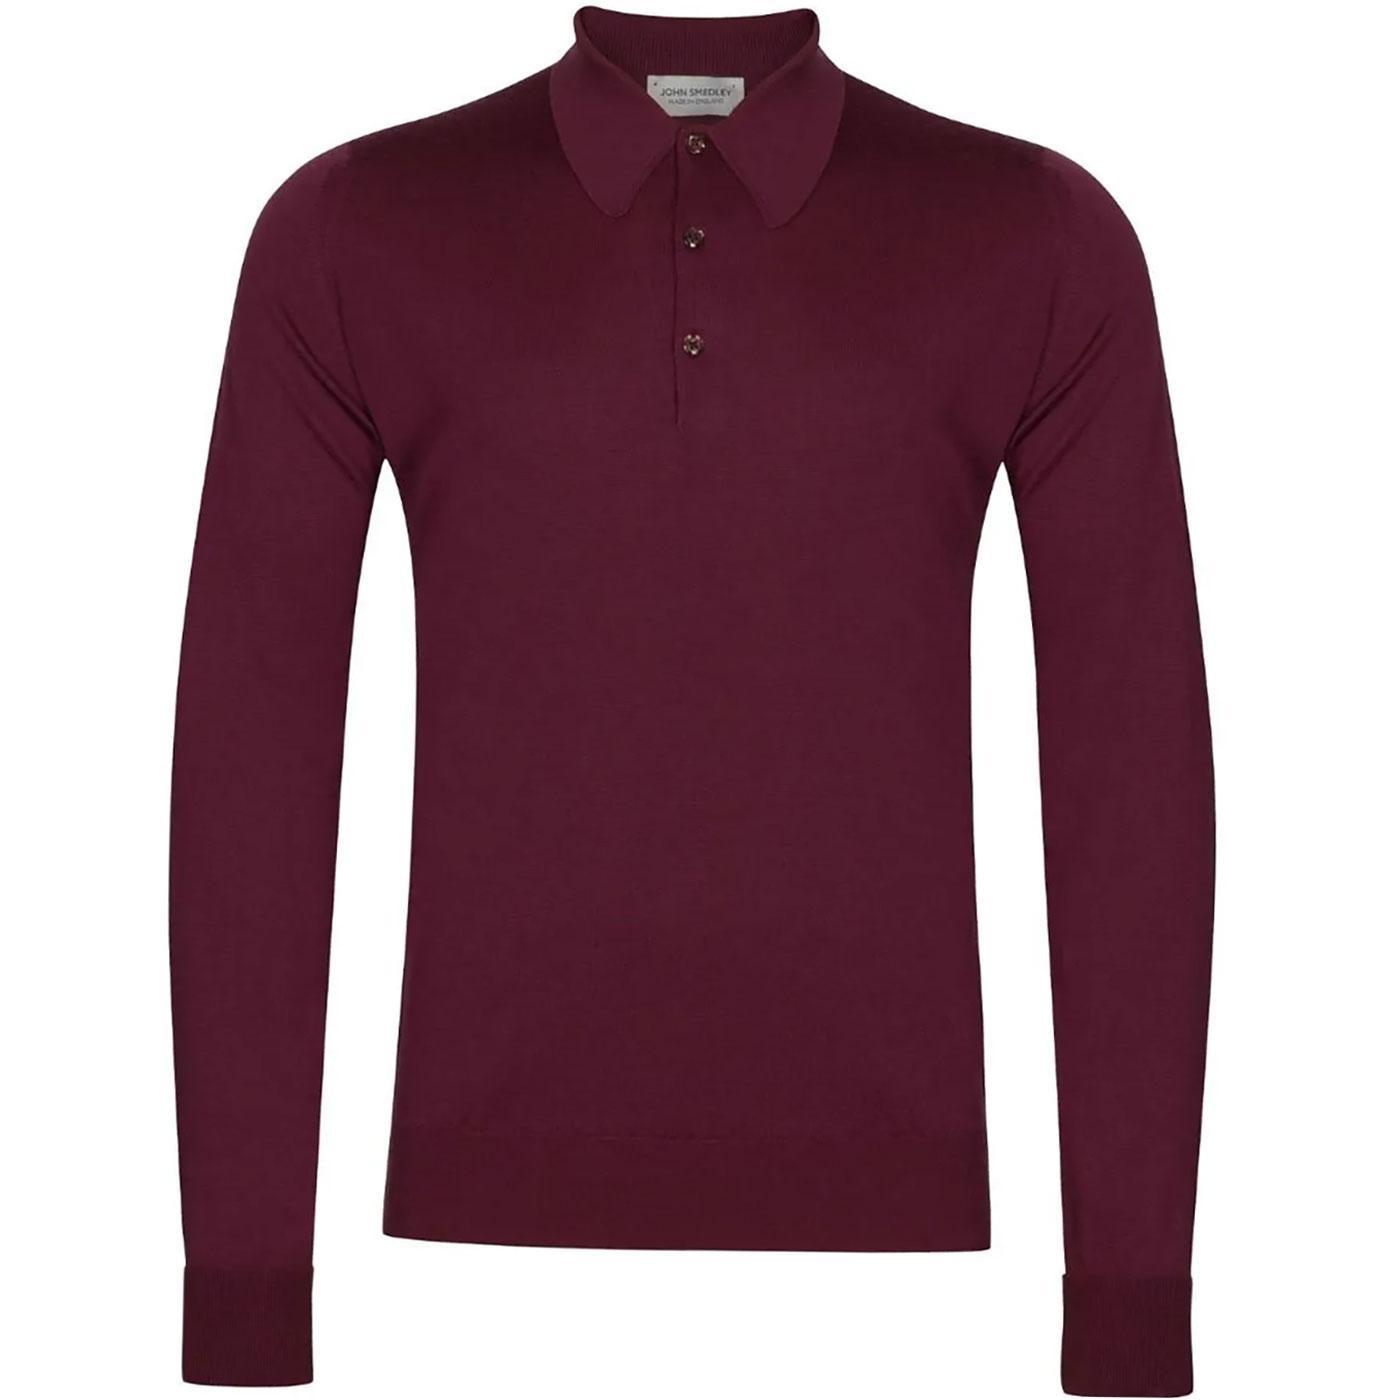 Dorset JOHN SMEDLEY Mens Mod Knitted Polo Shirt EP